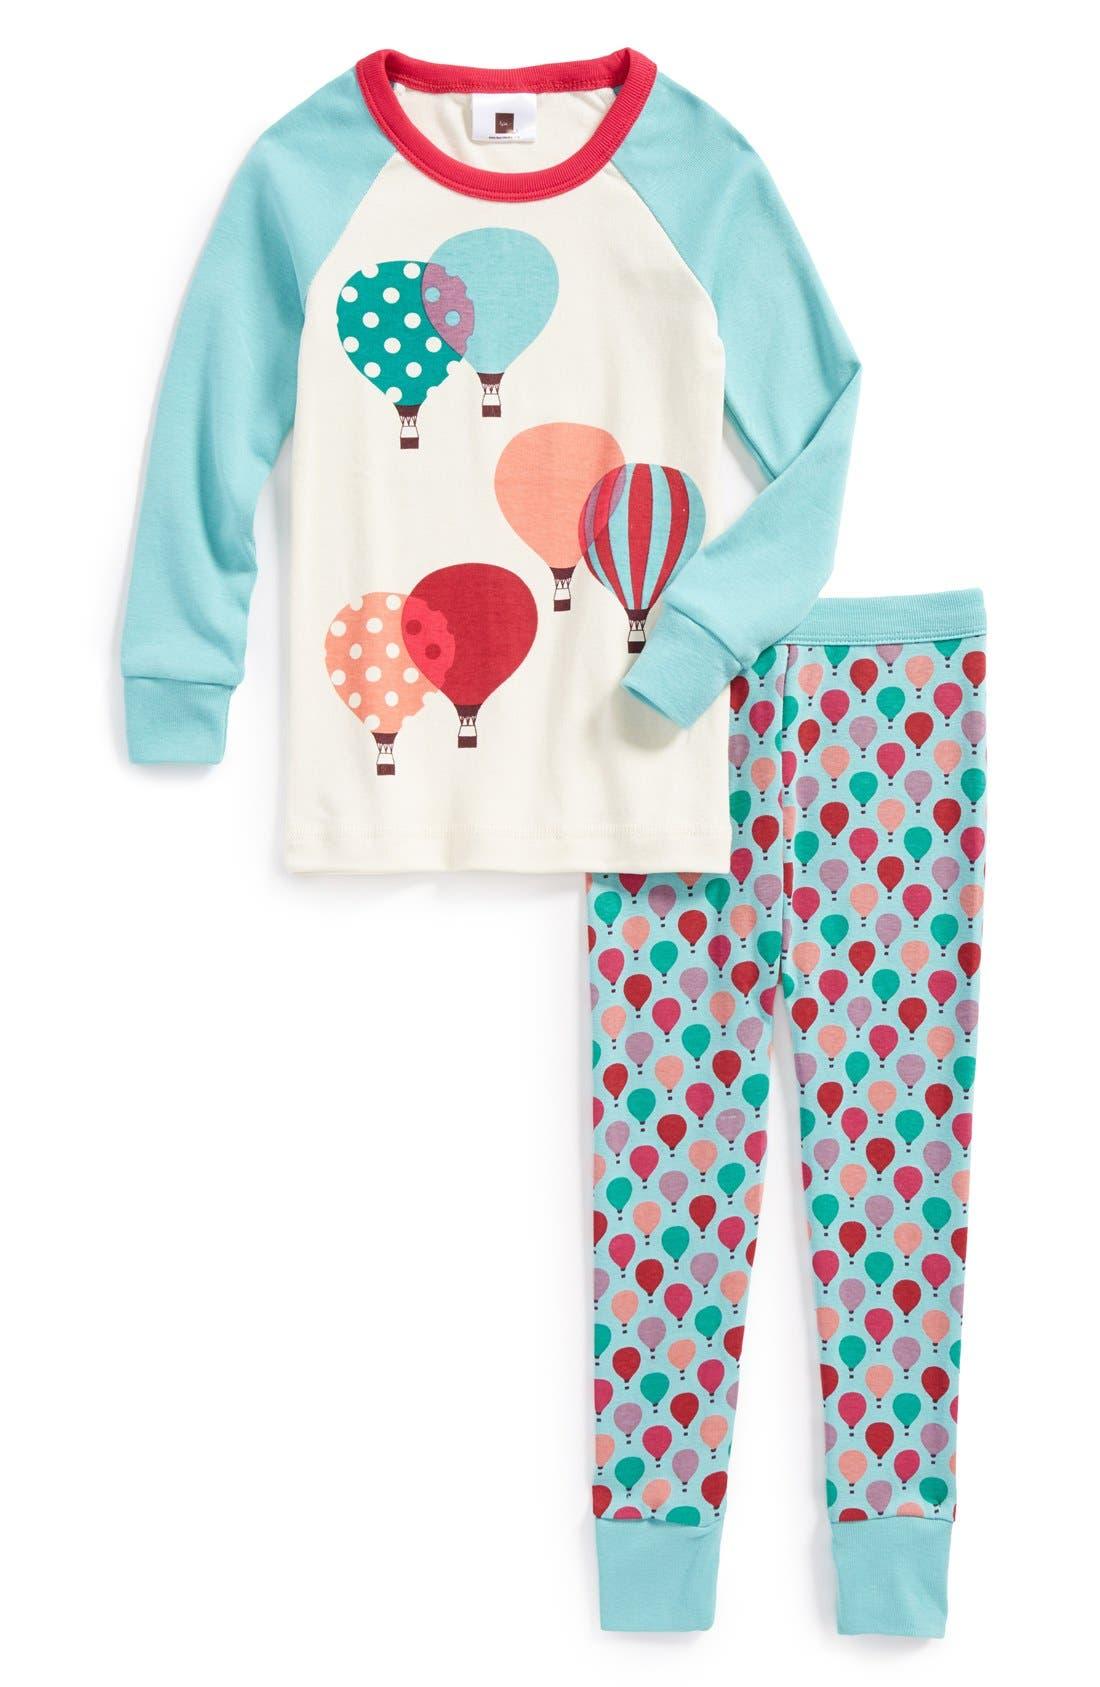 Main Image - Tea Collection 'Luftballons' Two-Piece Fitted Pajamas (Toddler Girls, Little Girls & Big Girls)